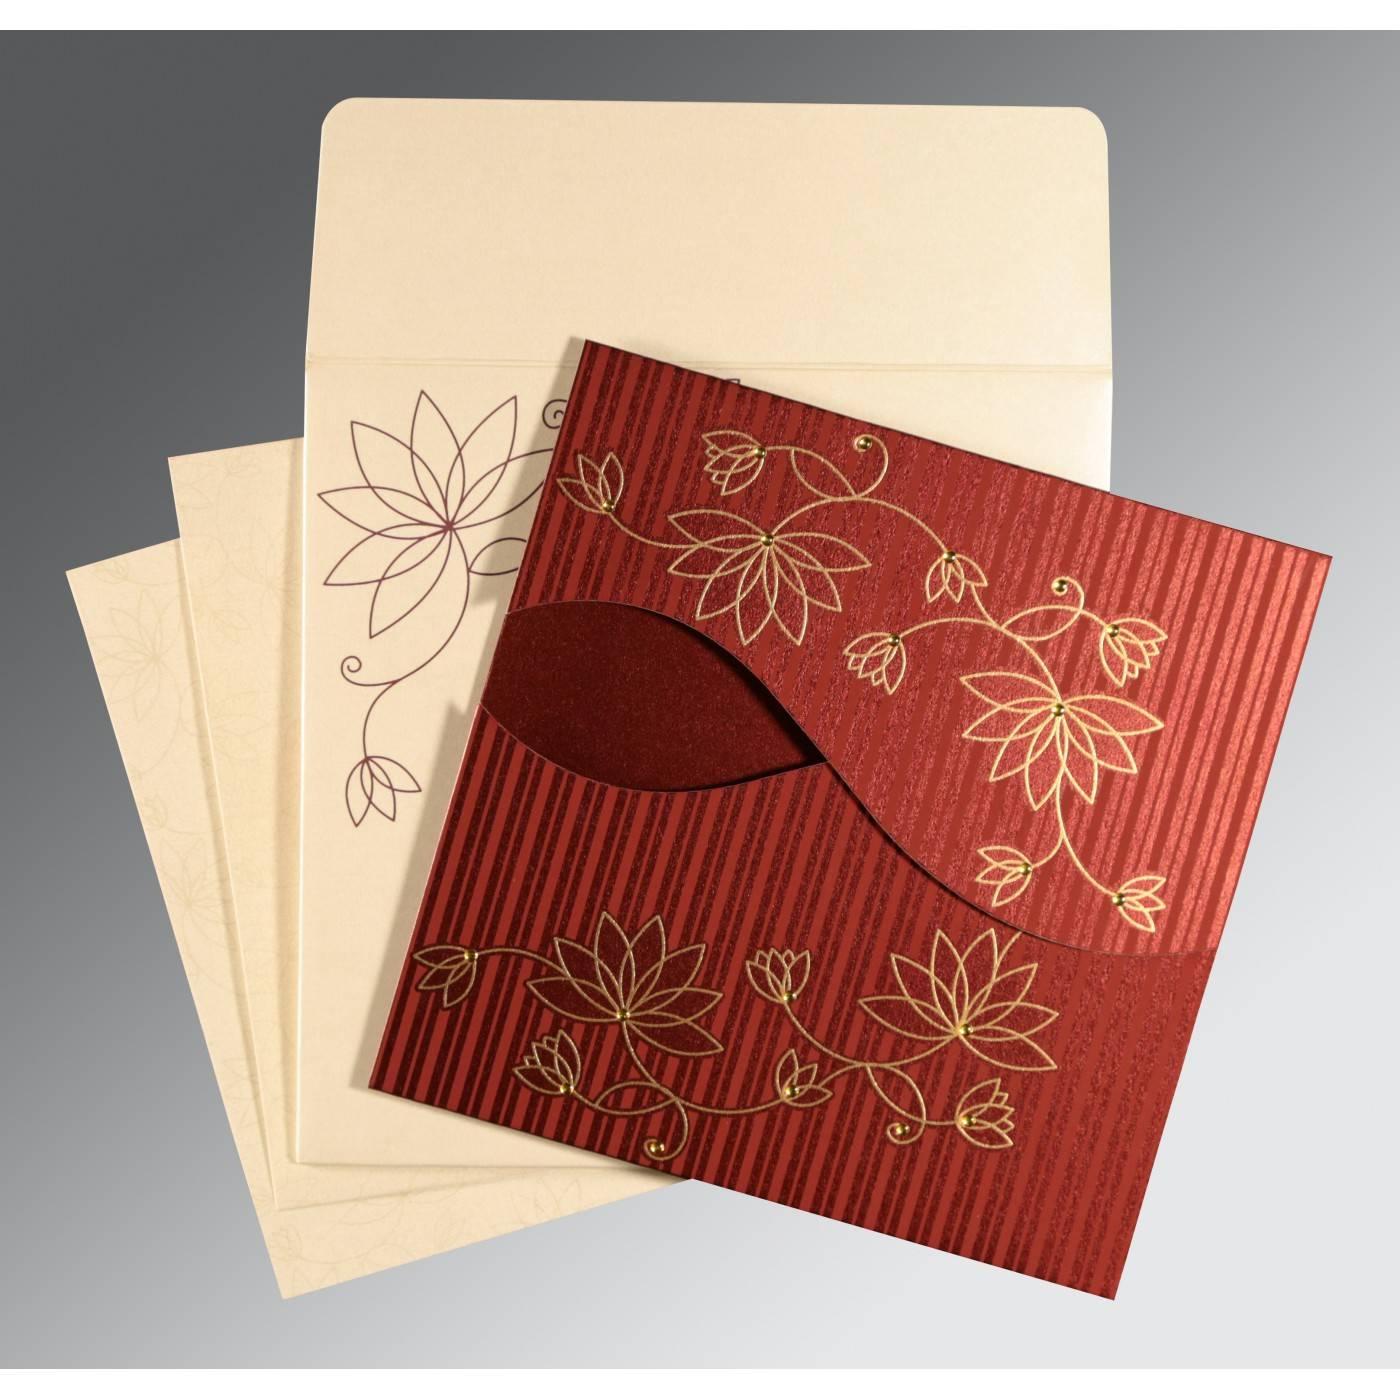 WINE RED SHIMMERY FLORAL THEMED - SCREEN PRINTED WEDDING INVITATION : RU-8251L - 123WeddingCards